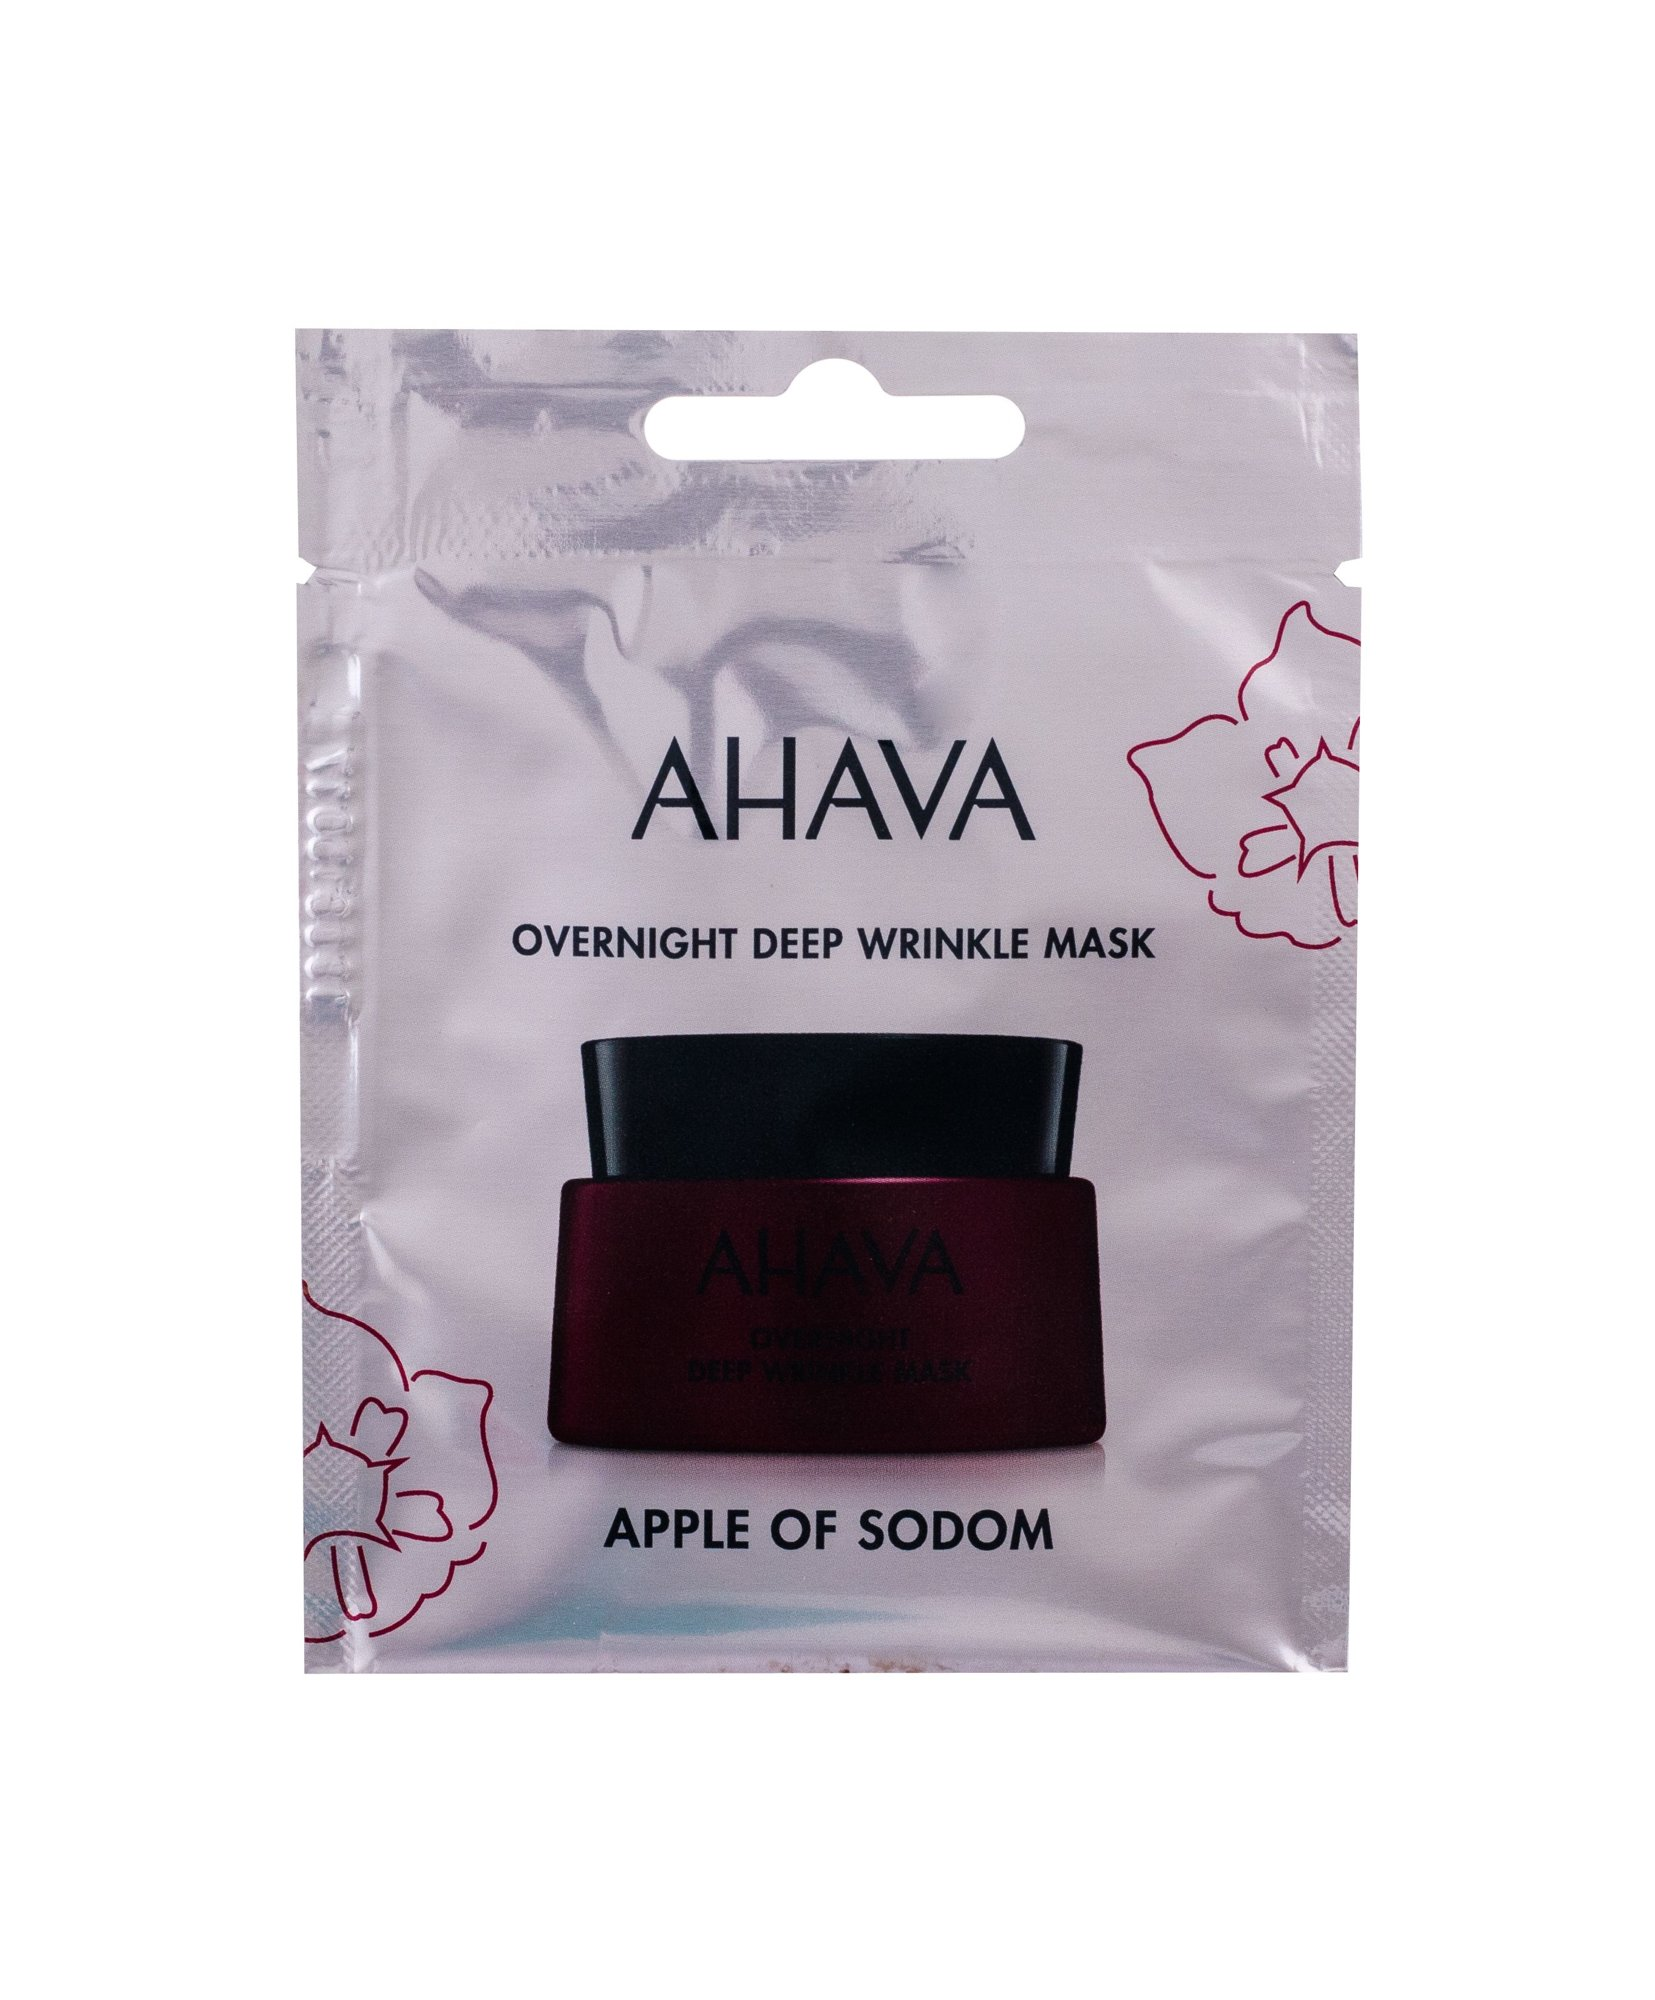 AHAVA Apple Of Sodom Face Mask 6ml  Overnight Deep Wrinkle Mask